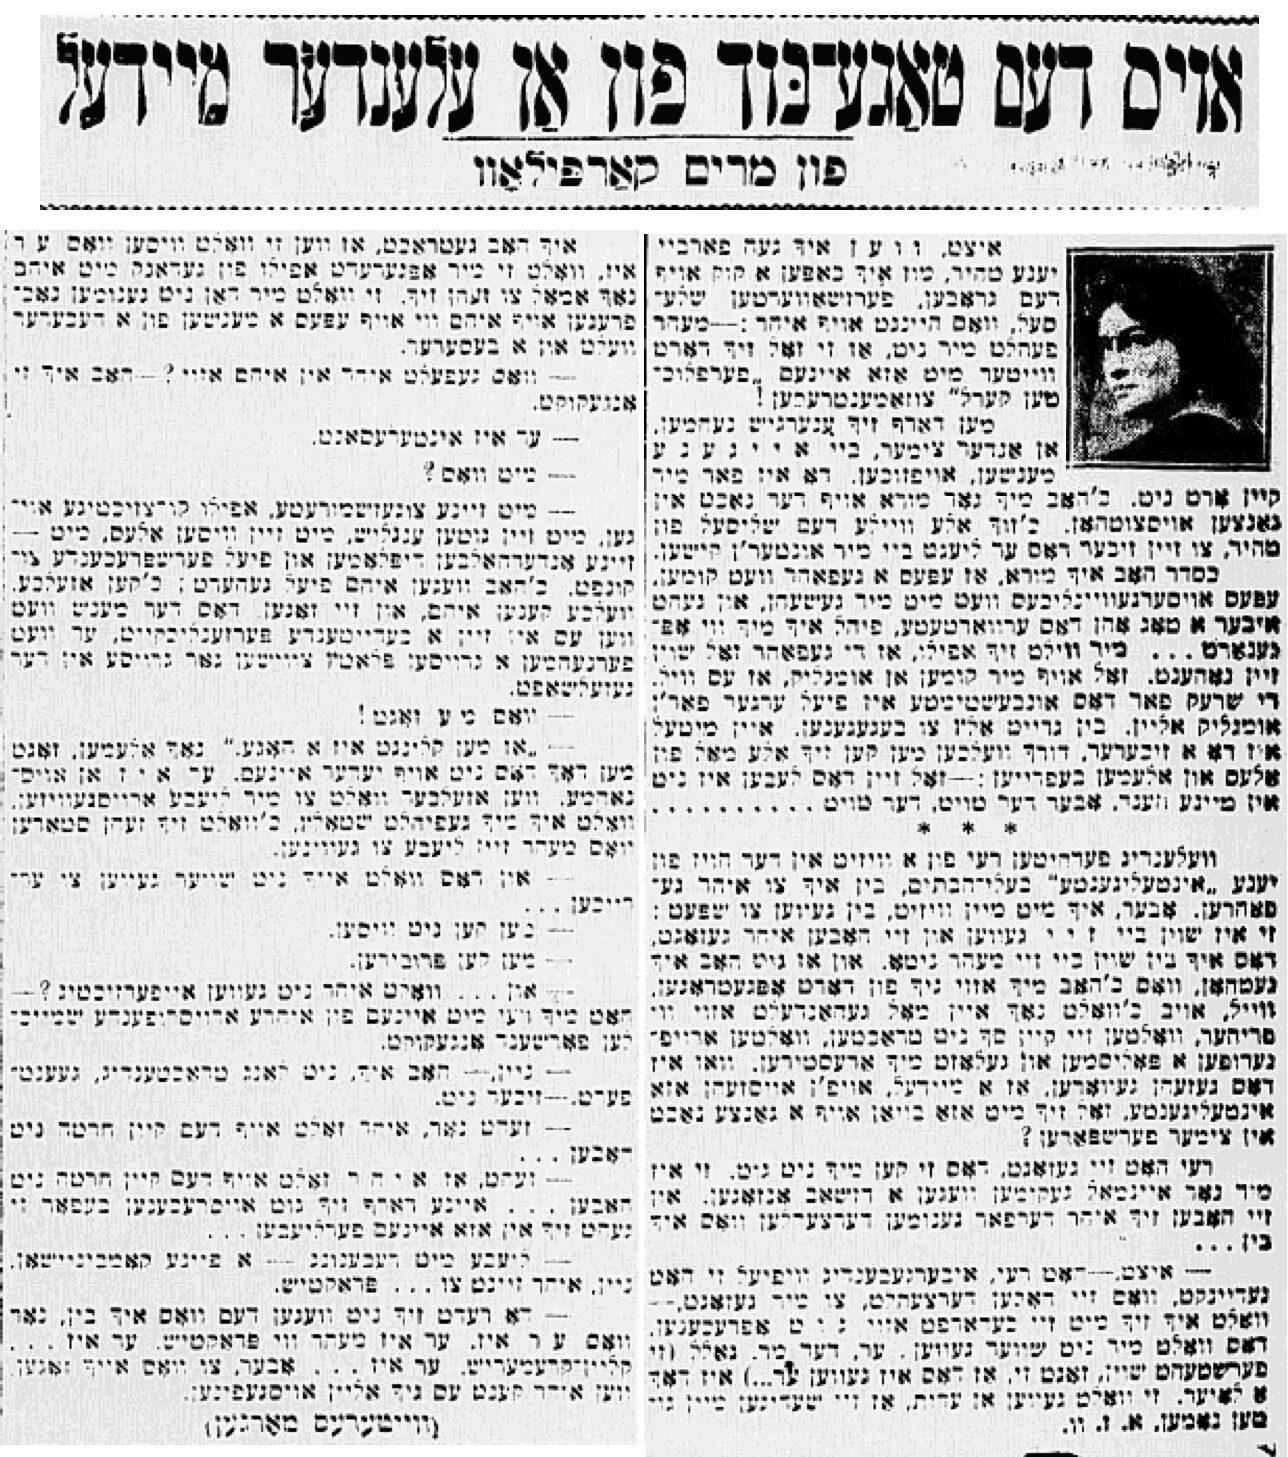 "<p>An installment of Karpilove's <em>Diary of a&nbsp;Lonely Girl</em> in the <em>Varhayt</em>, December <span class=""numbers"">28</span>,&nbsp;<span class=""numbers"">1916</span></p>"